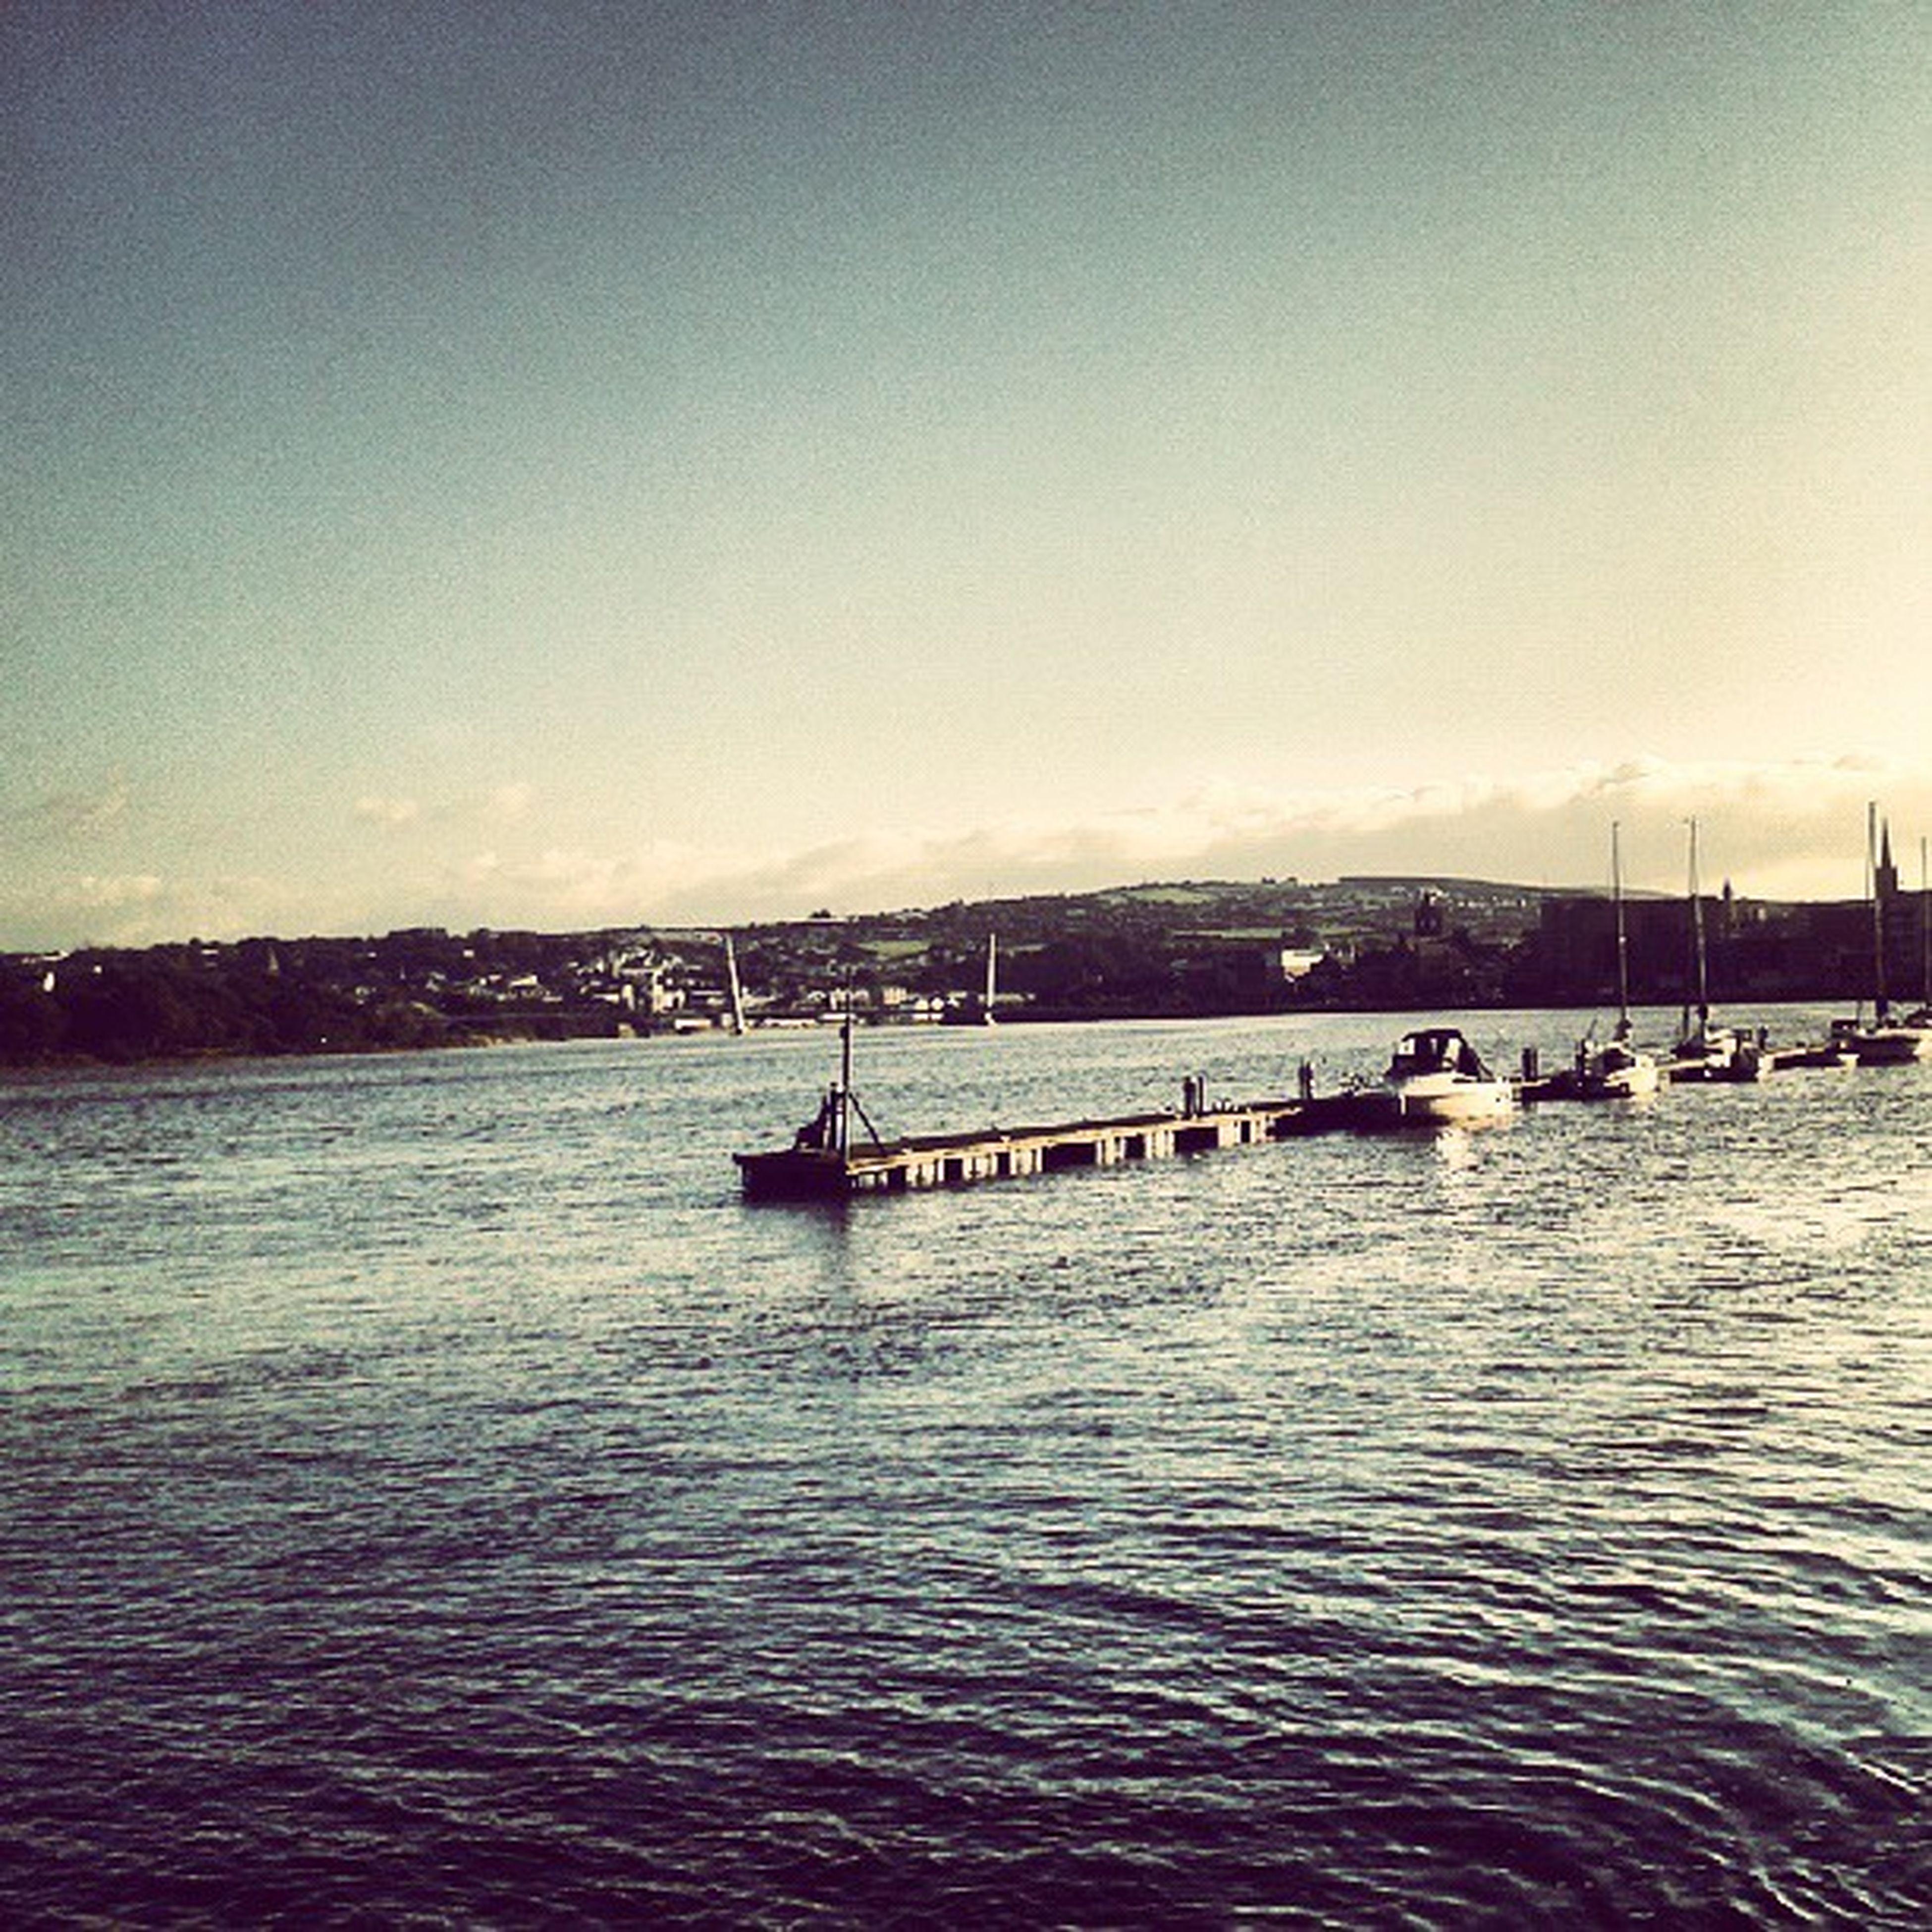 Derry is just so pretty♥ Derry Foyle Peacebridge Beautiful lovederry ireland walkies